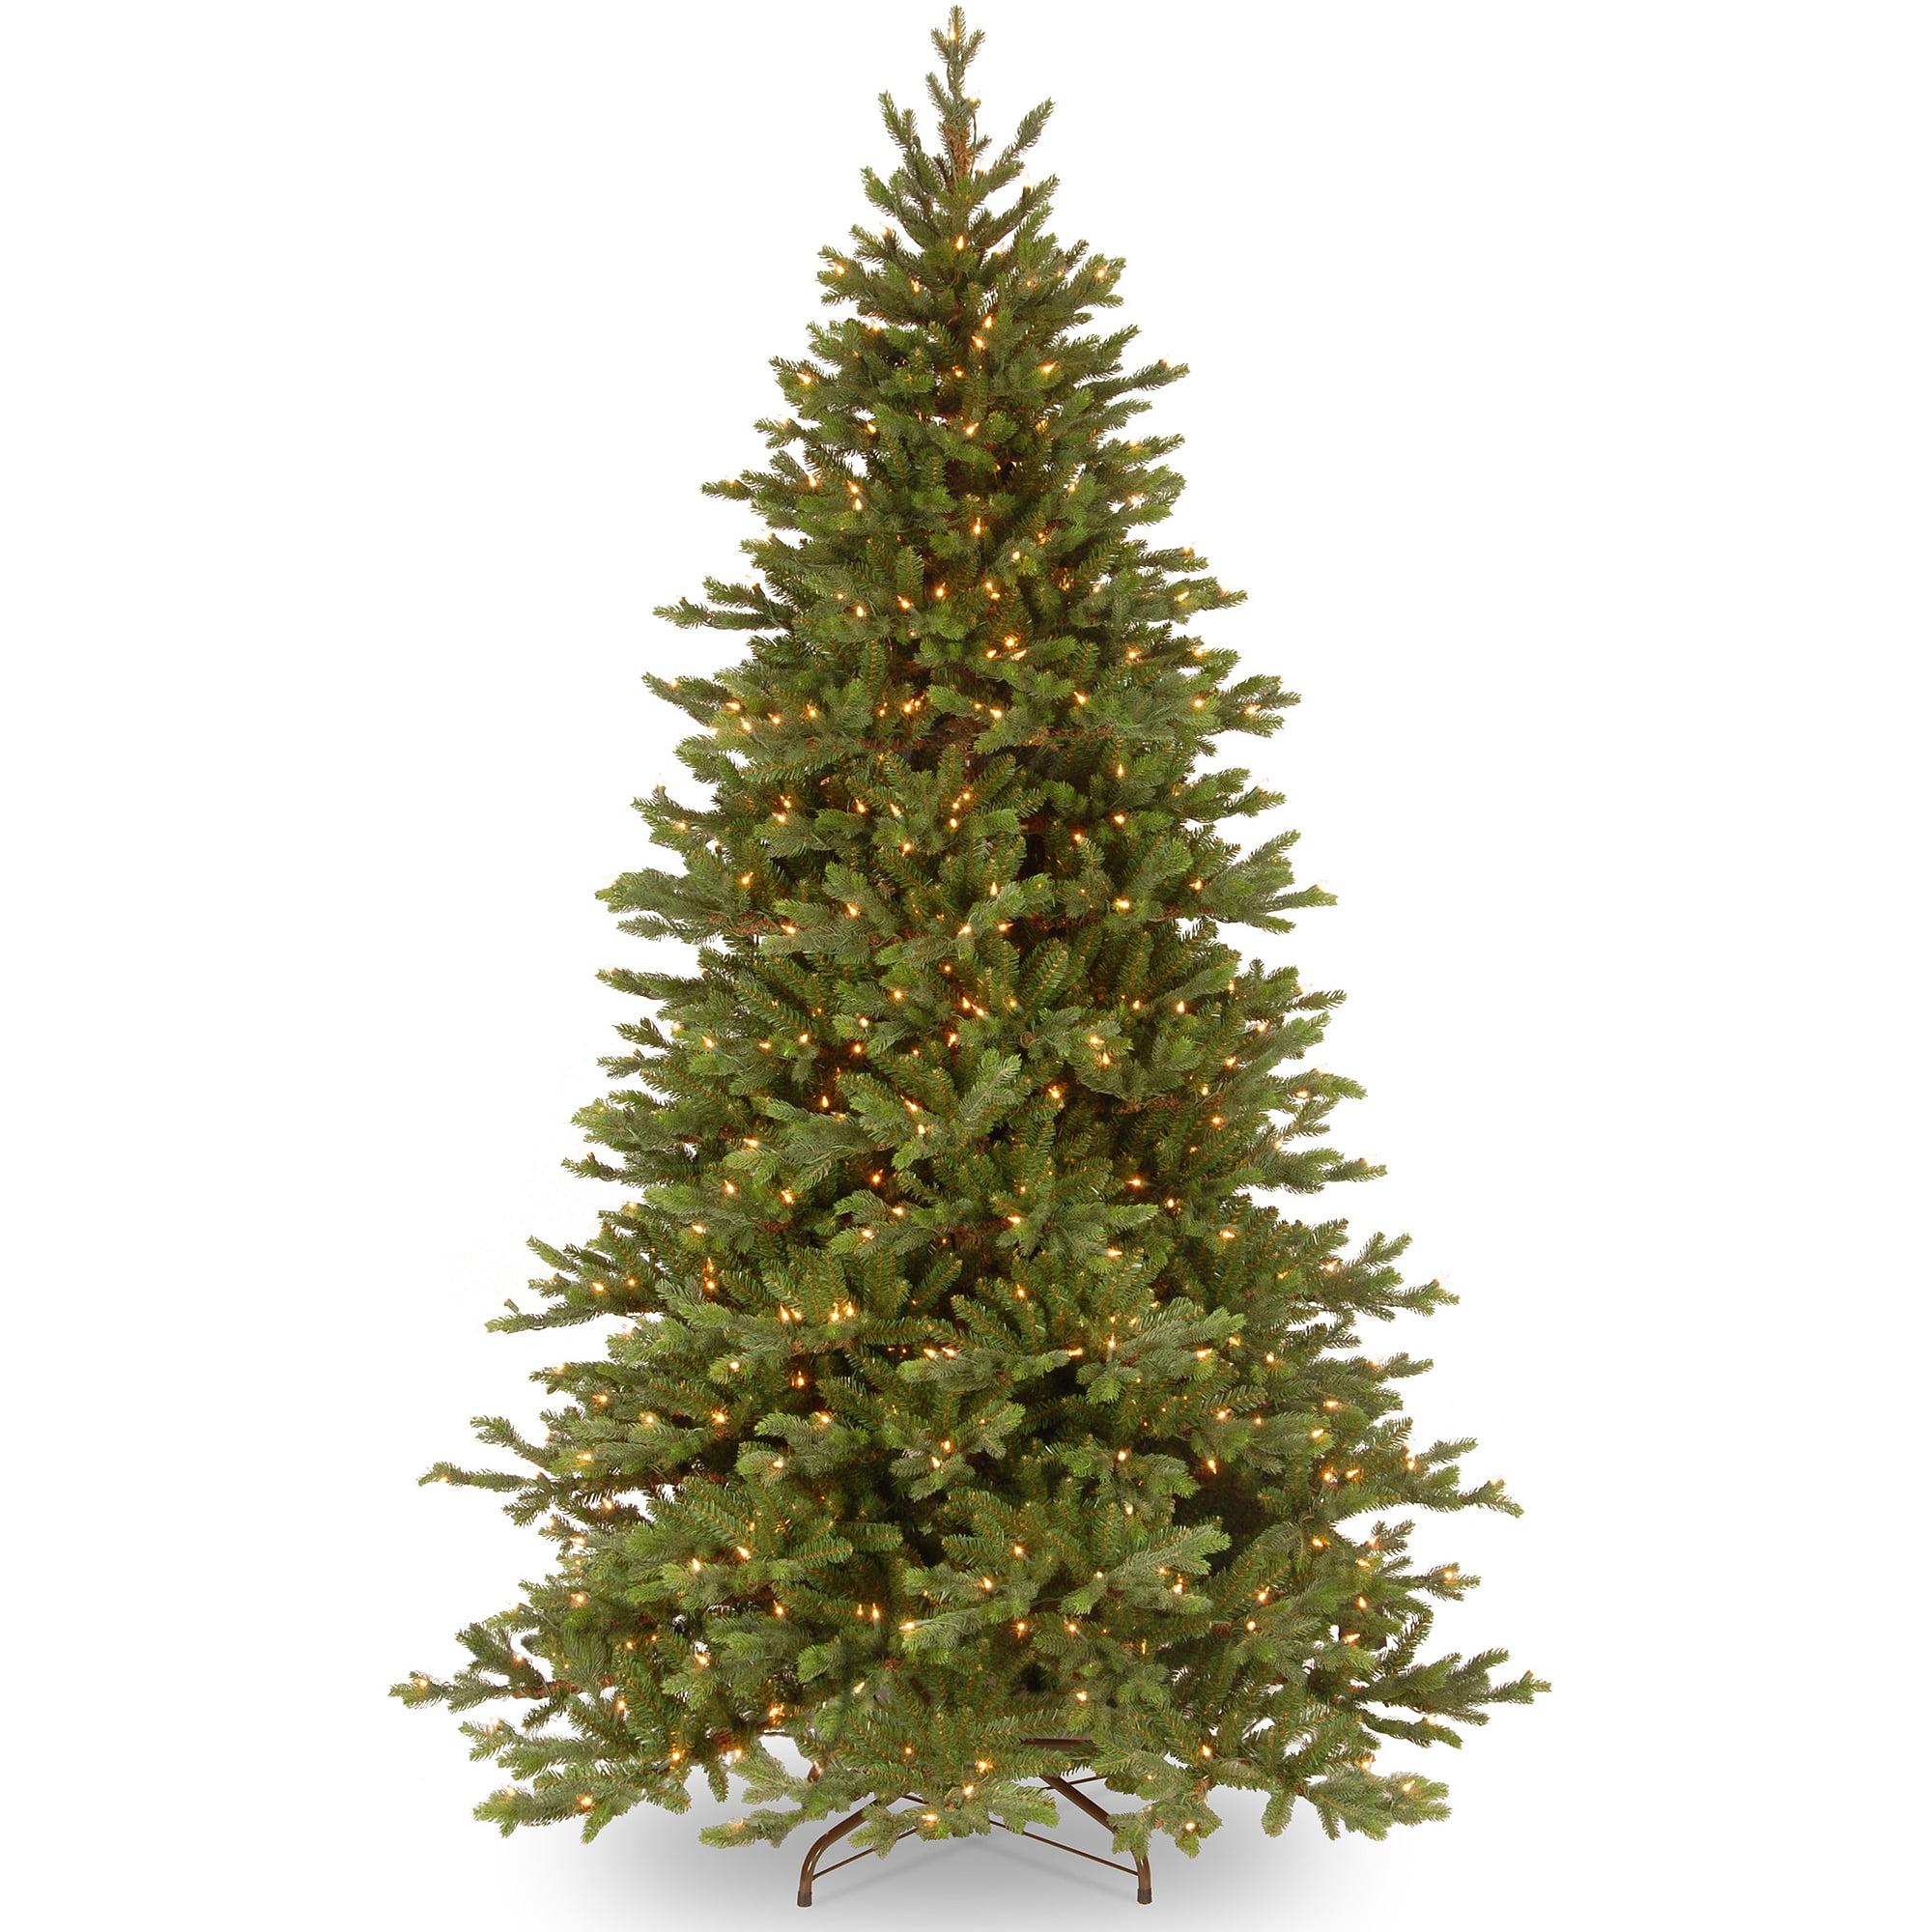 real christmas trees delivered 6 green fir freshly cut christmas tree walmartcom - Real Christmas Trees Delivered